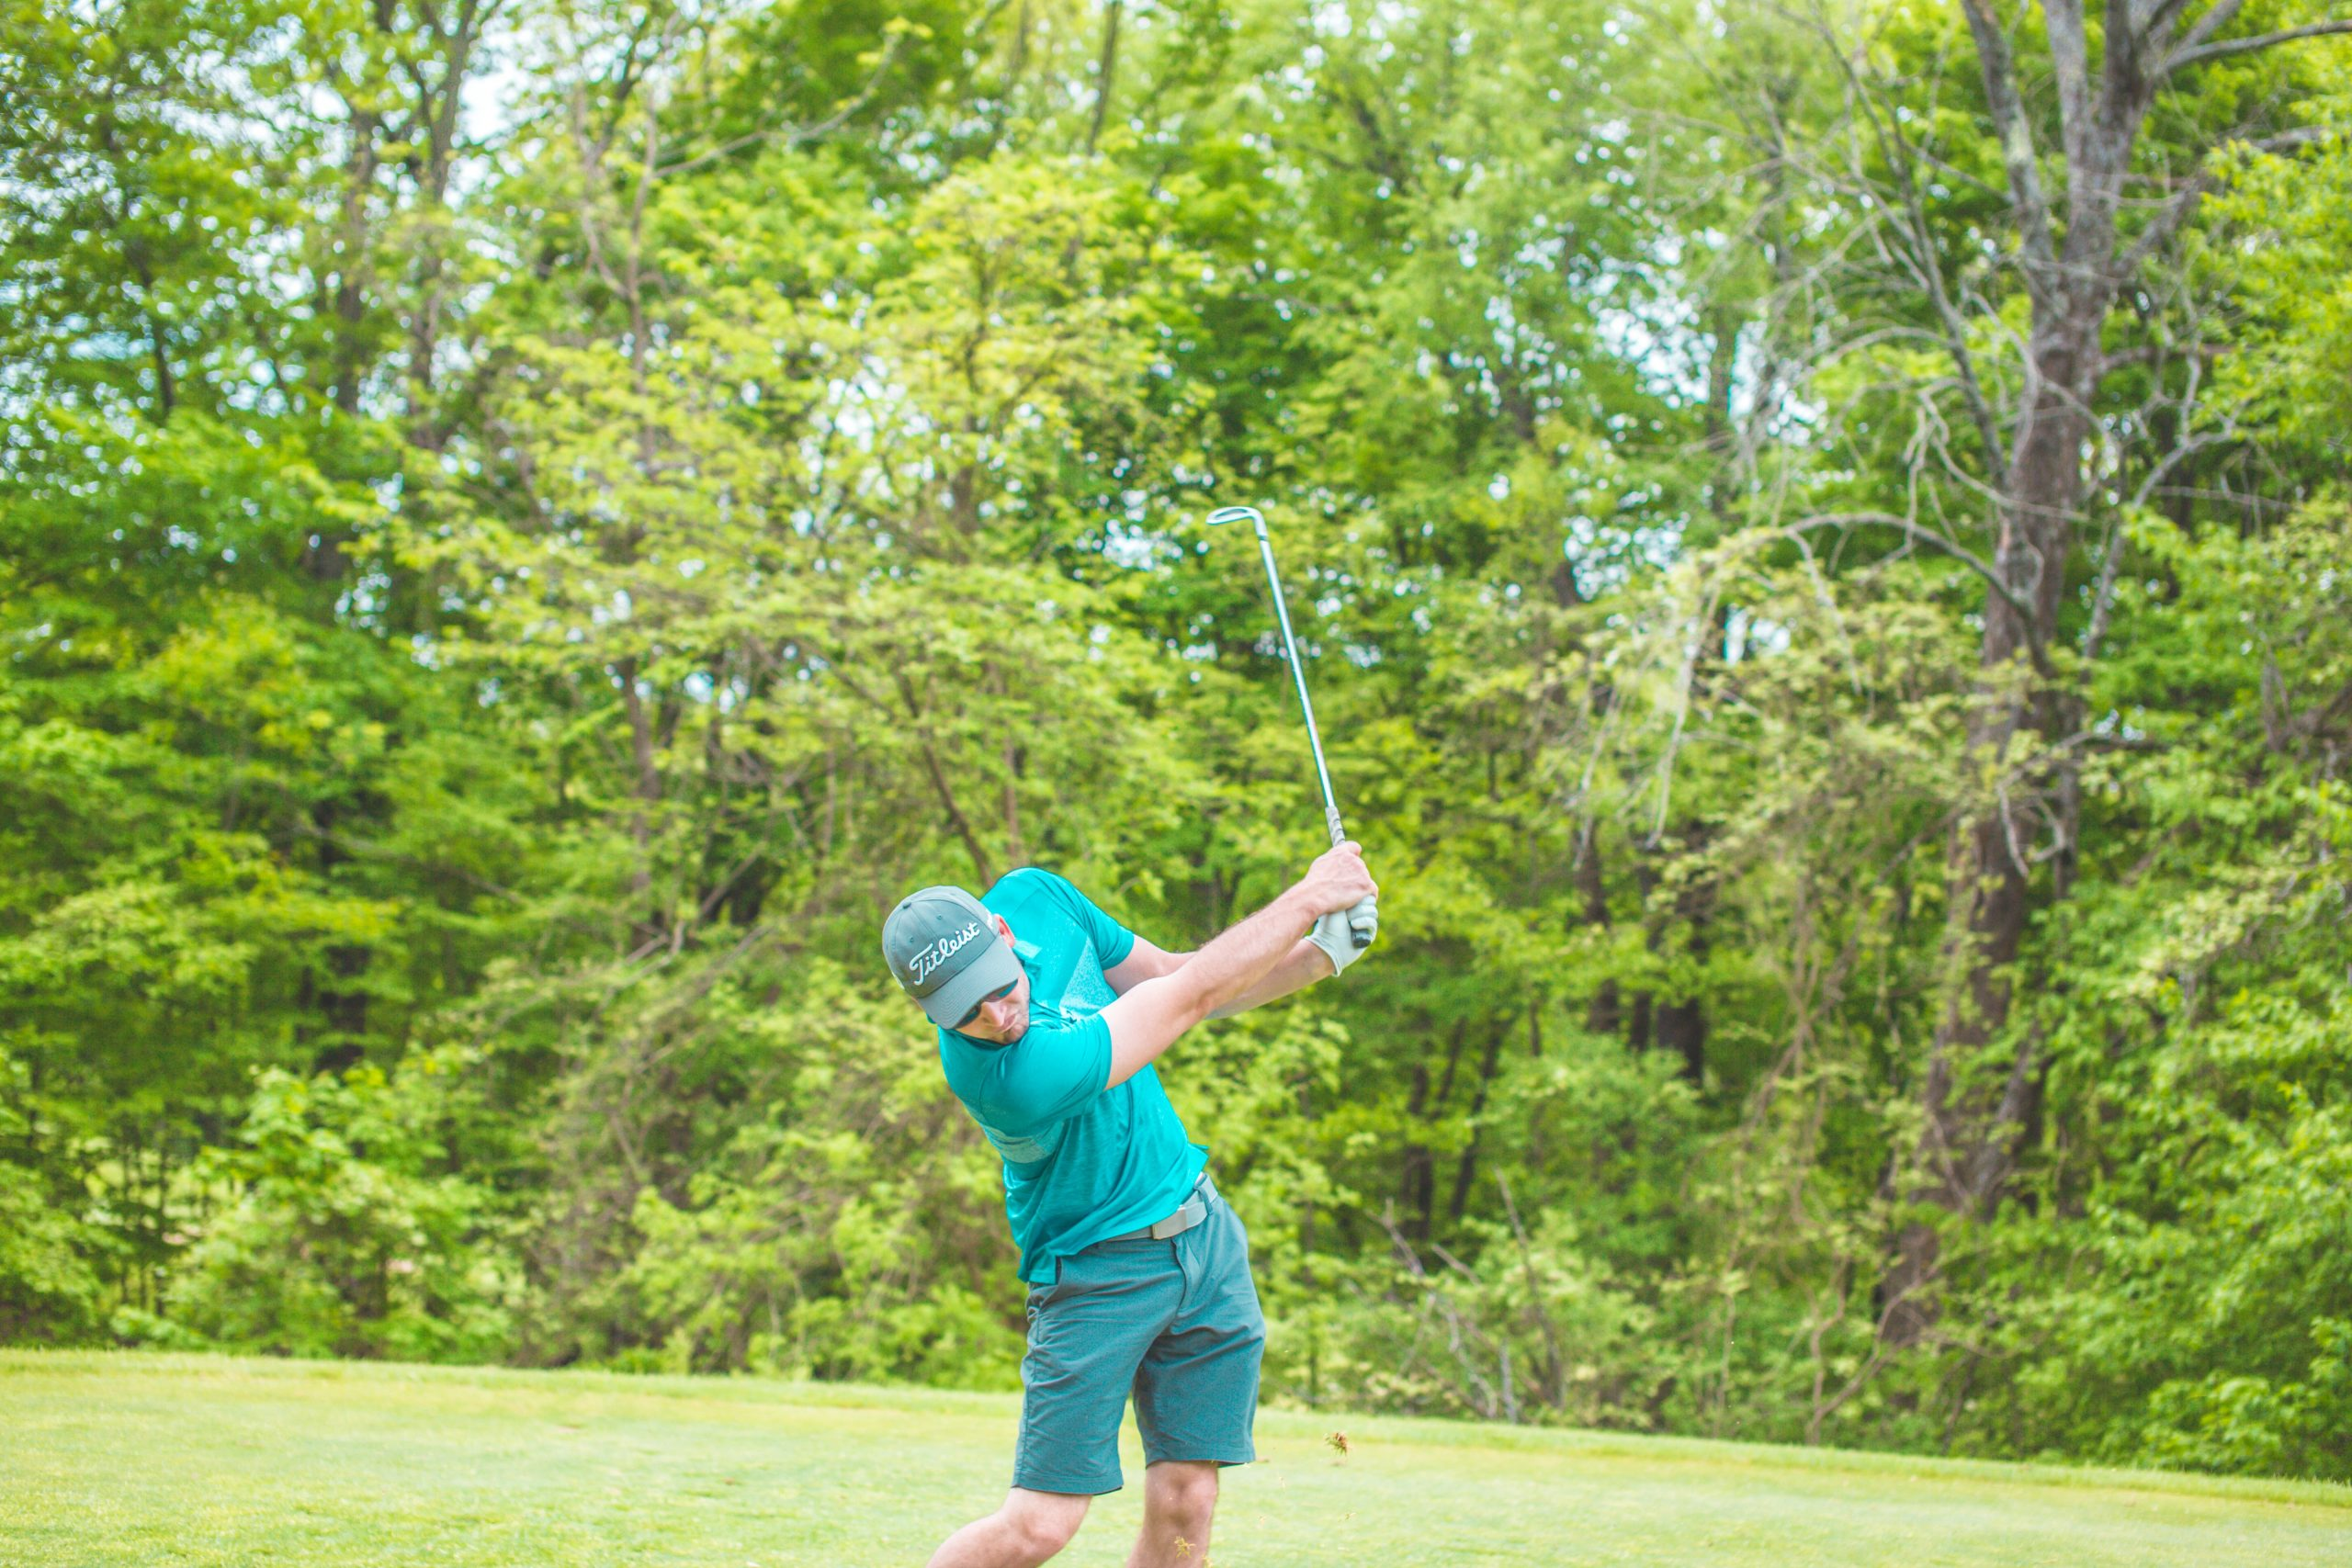 Golfer shanking his golf shot